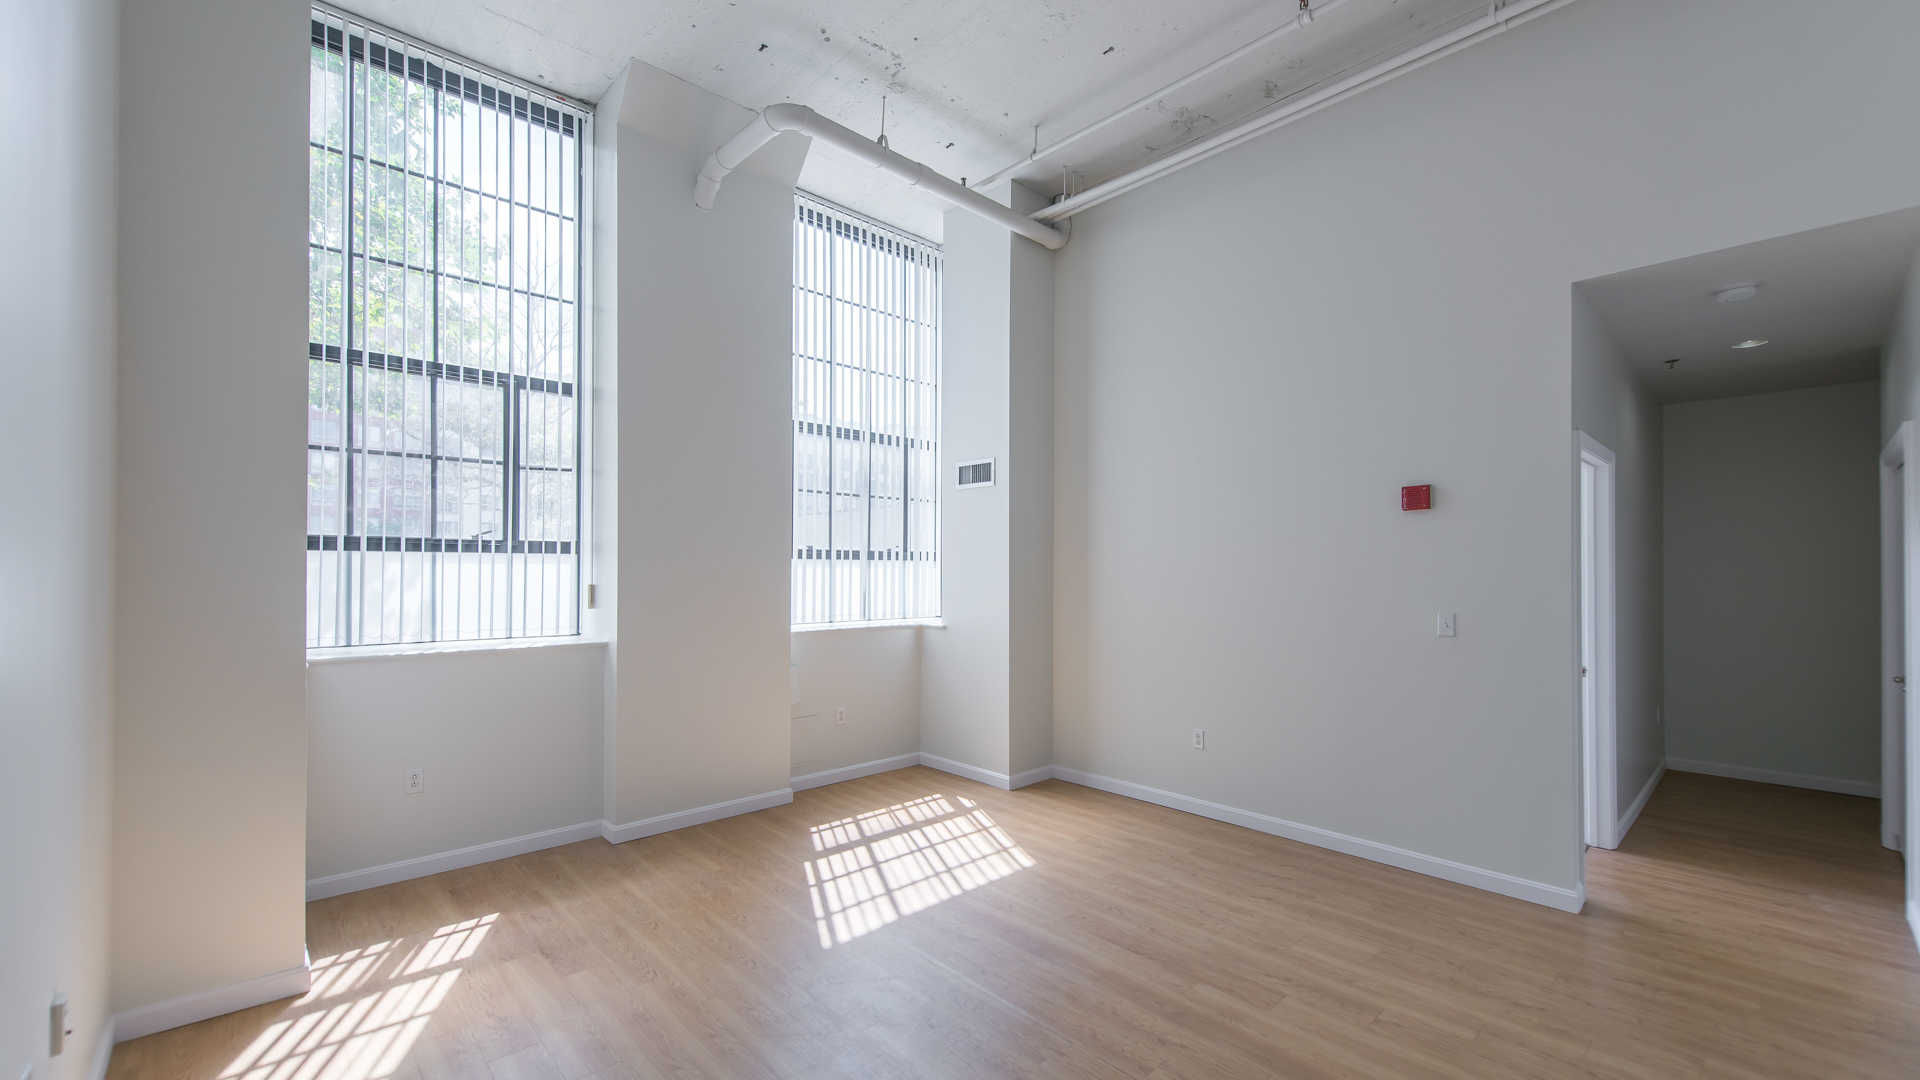 Lofts at kendall square apartments living room